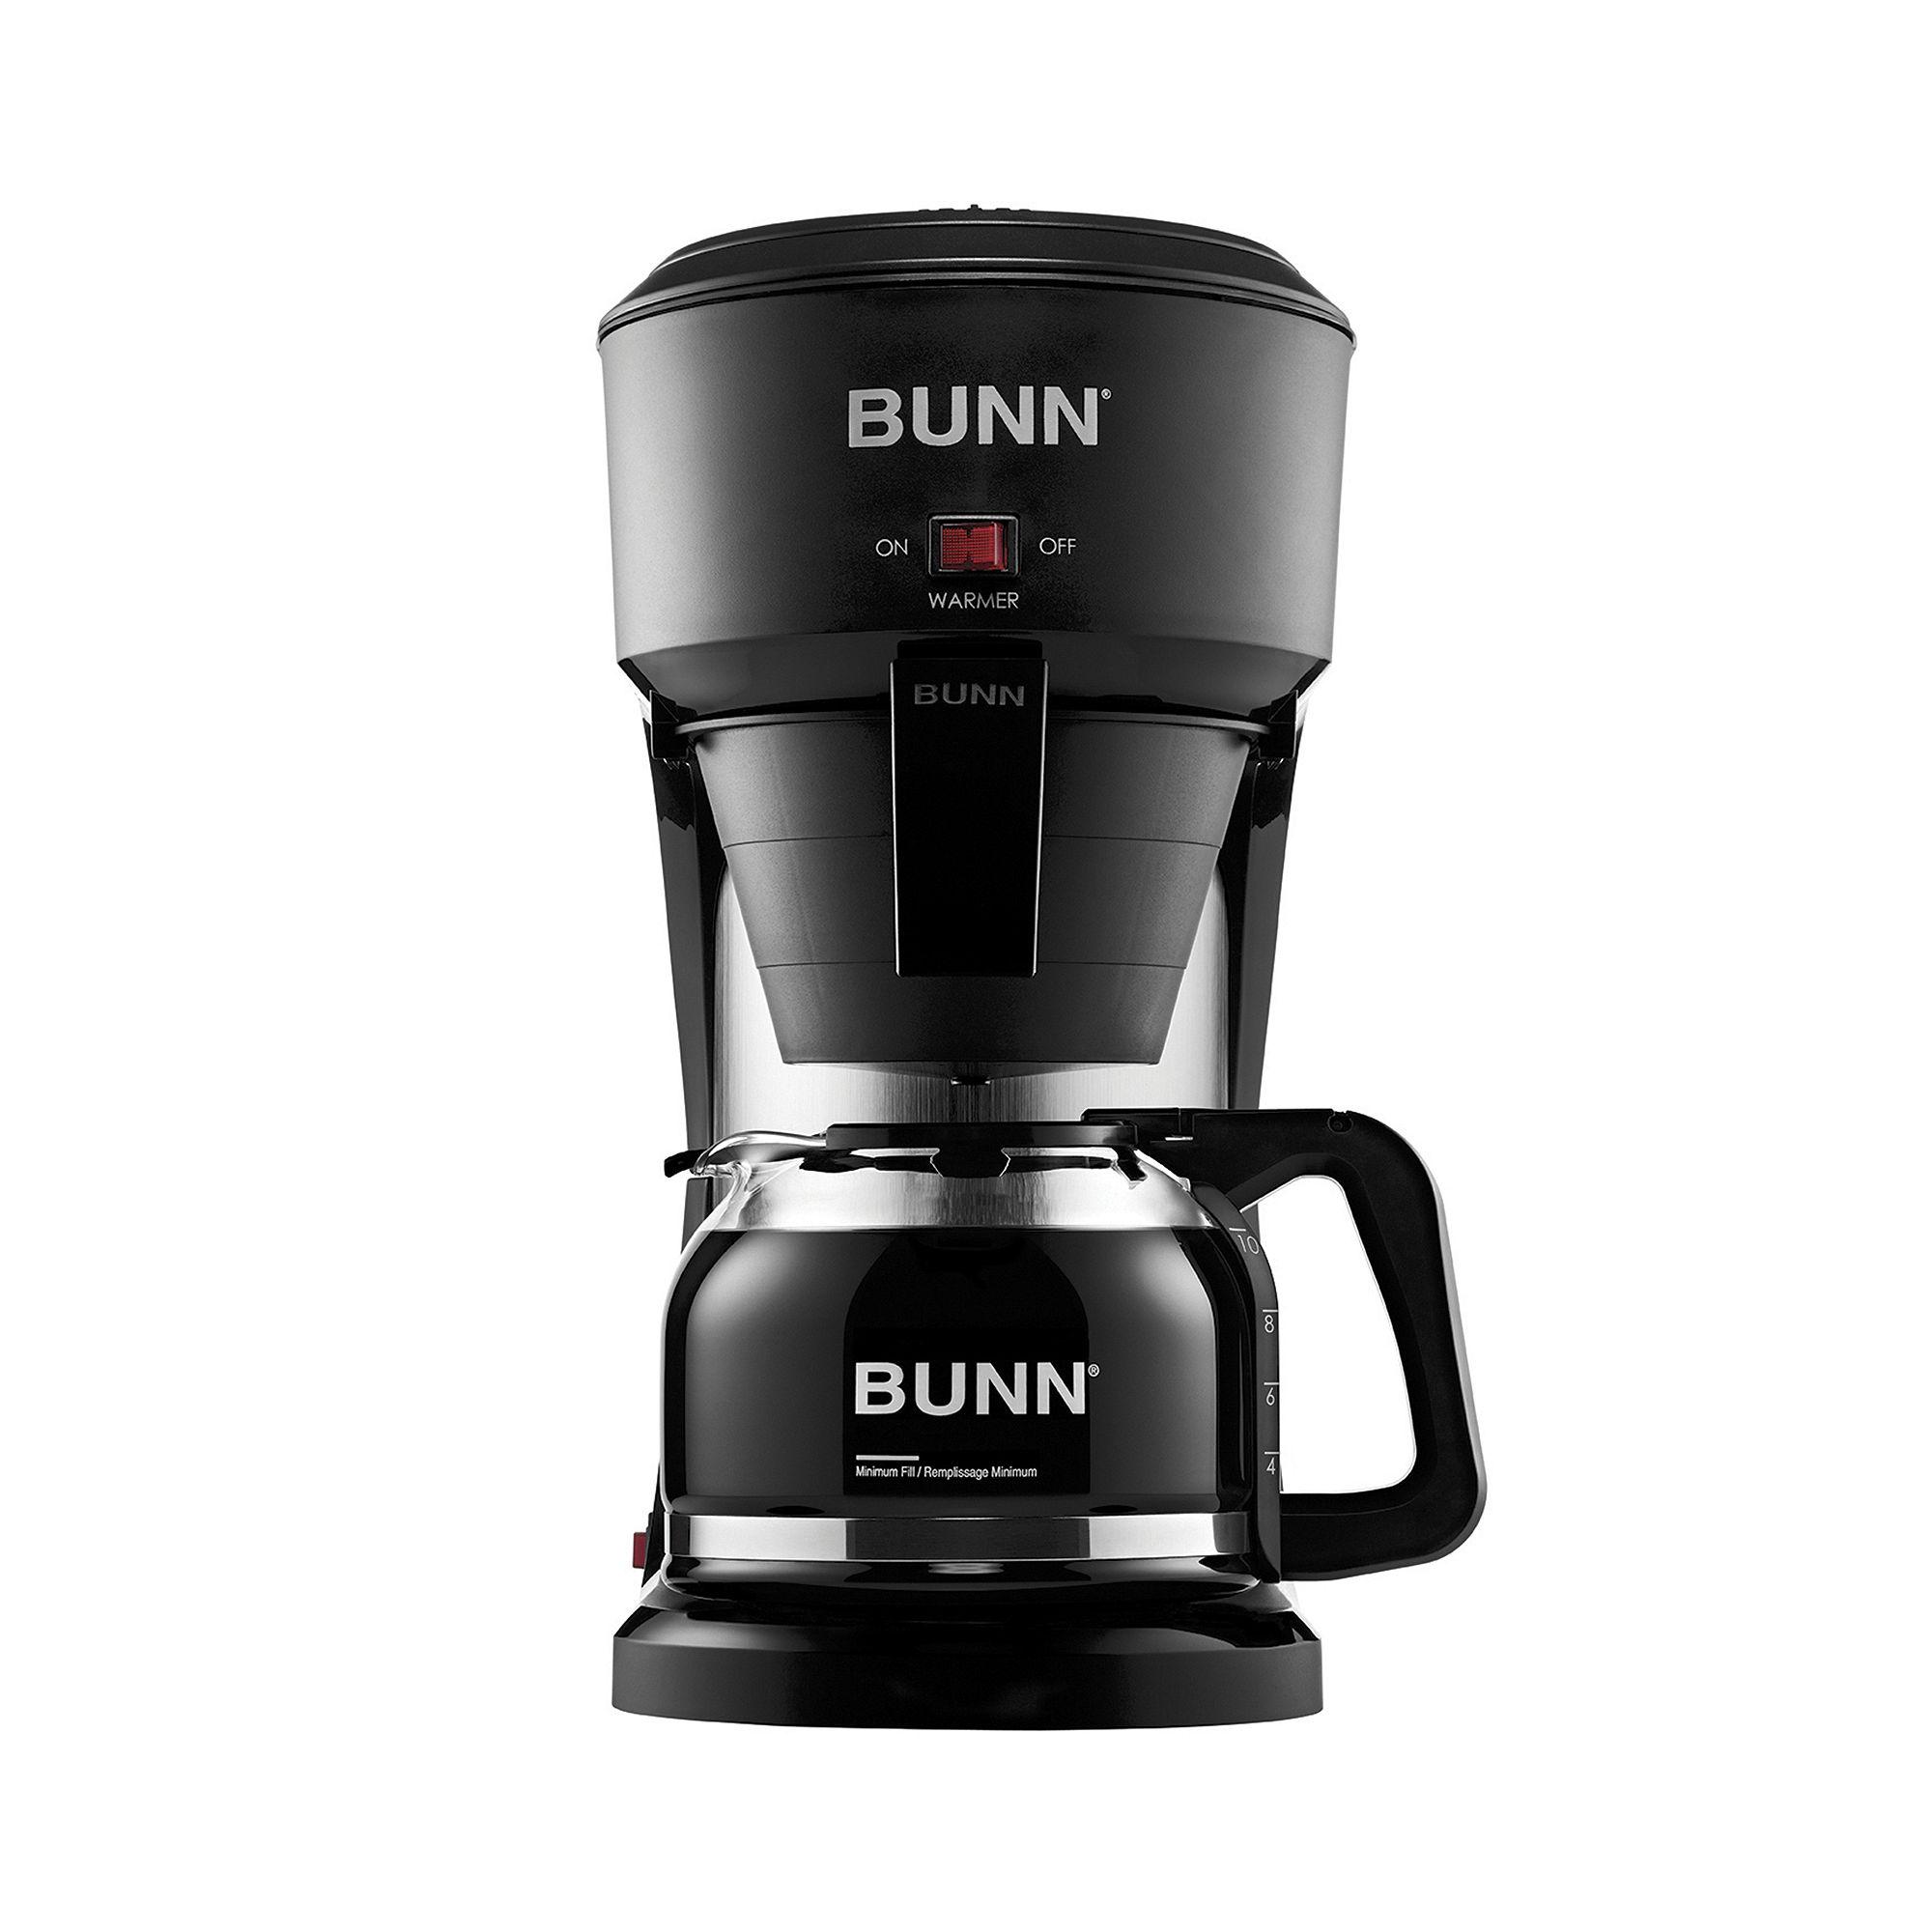 Bunn+coffee+maker+sprayhead - Find it at Shopwiki